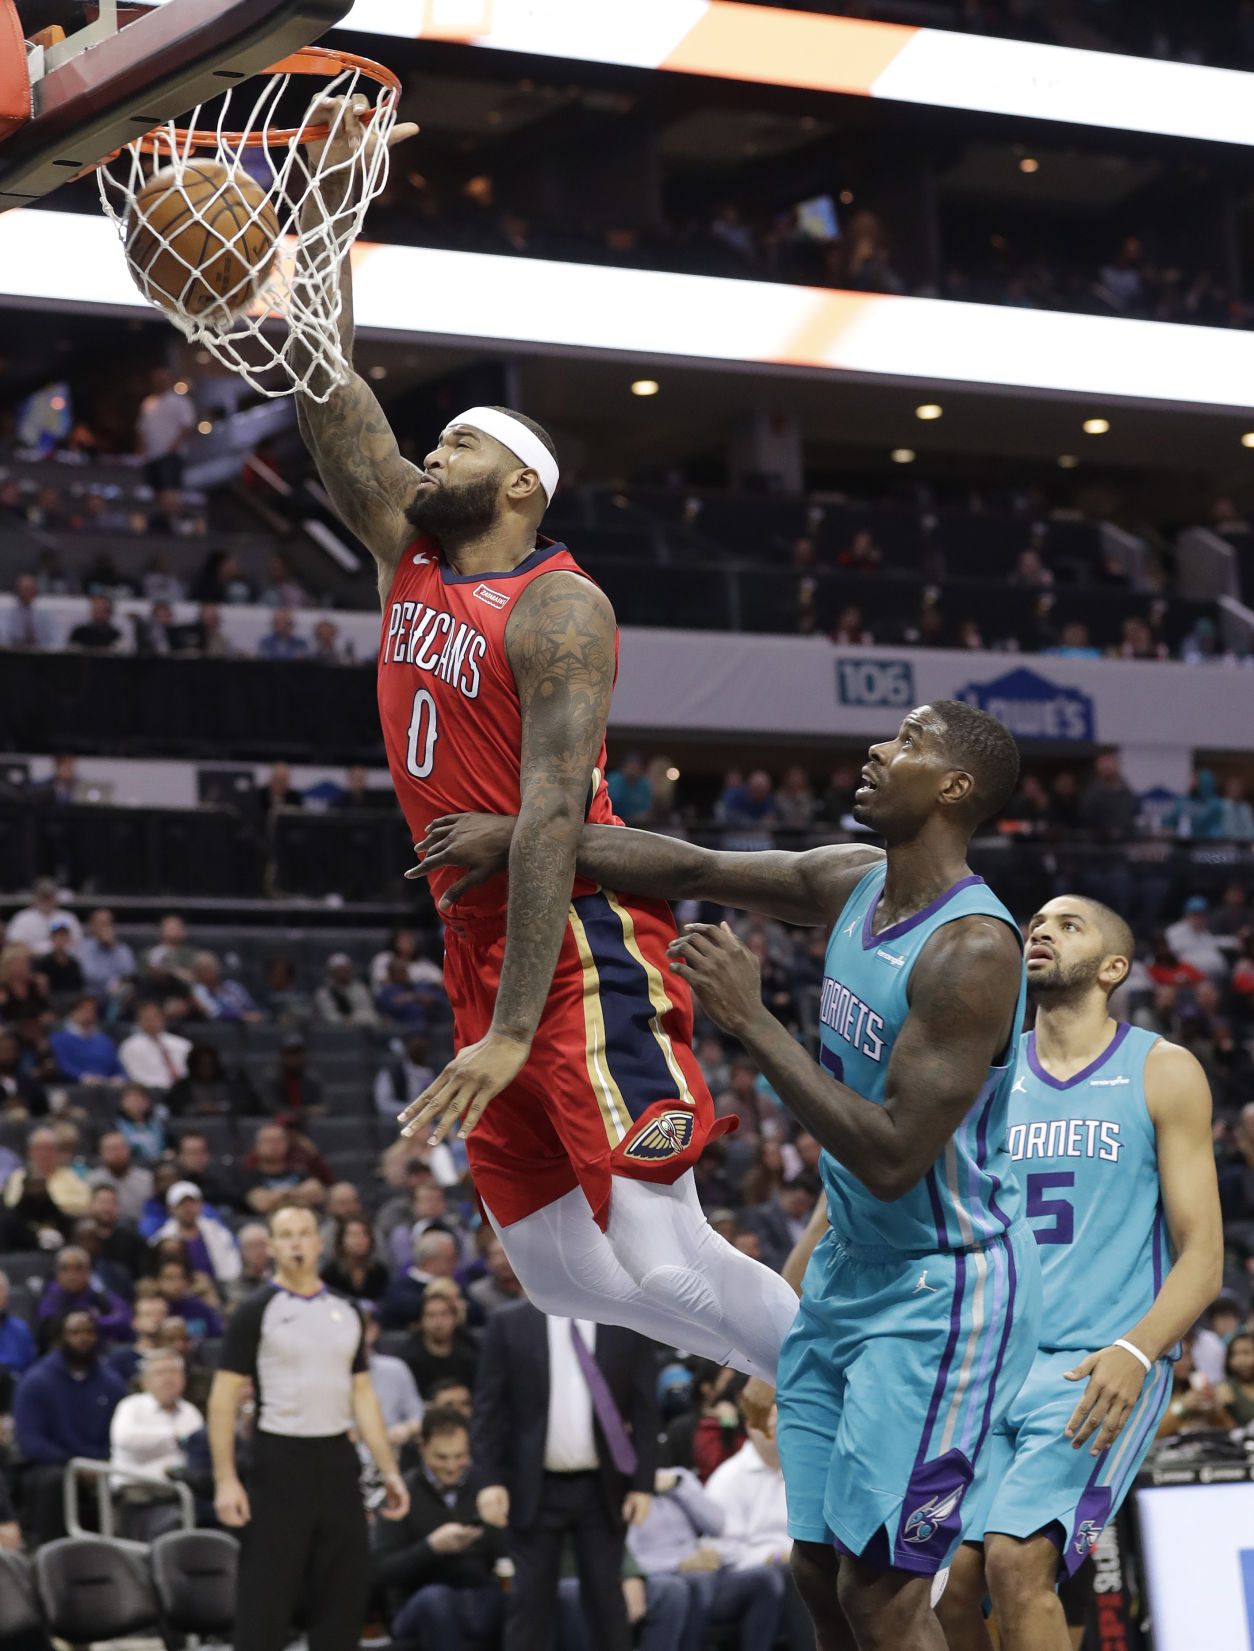 Marvelous New Orleans Pelicans Box Office Designs